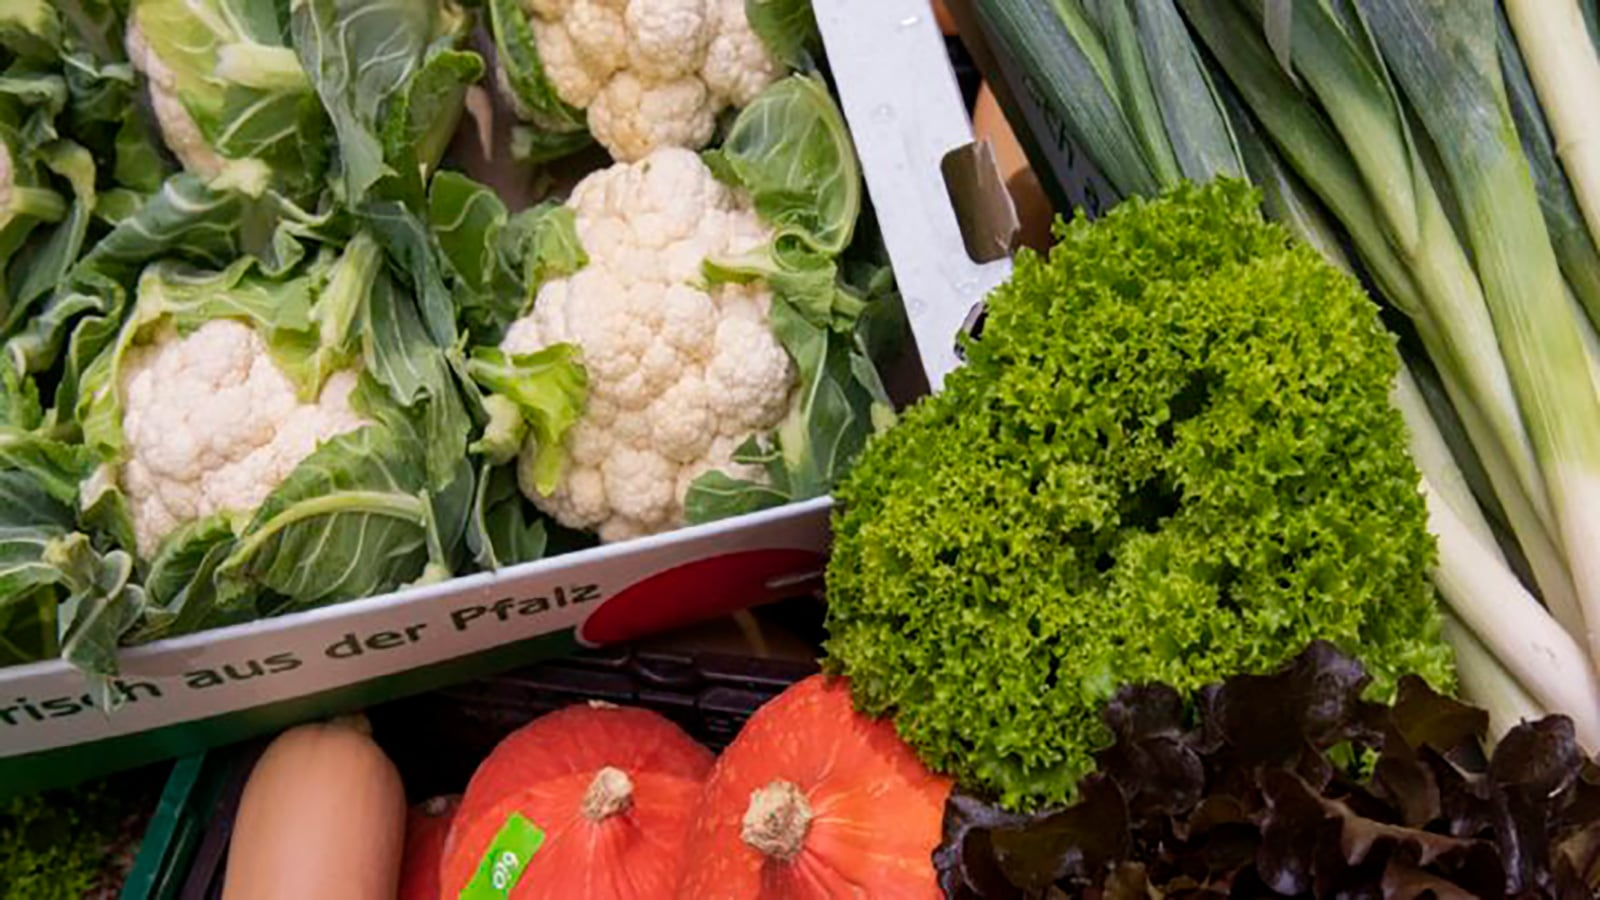 Pfalzmarkt Start Frischgemüse Saison 2018